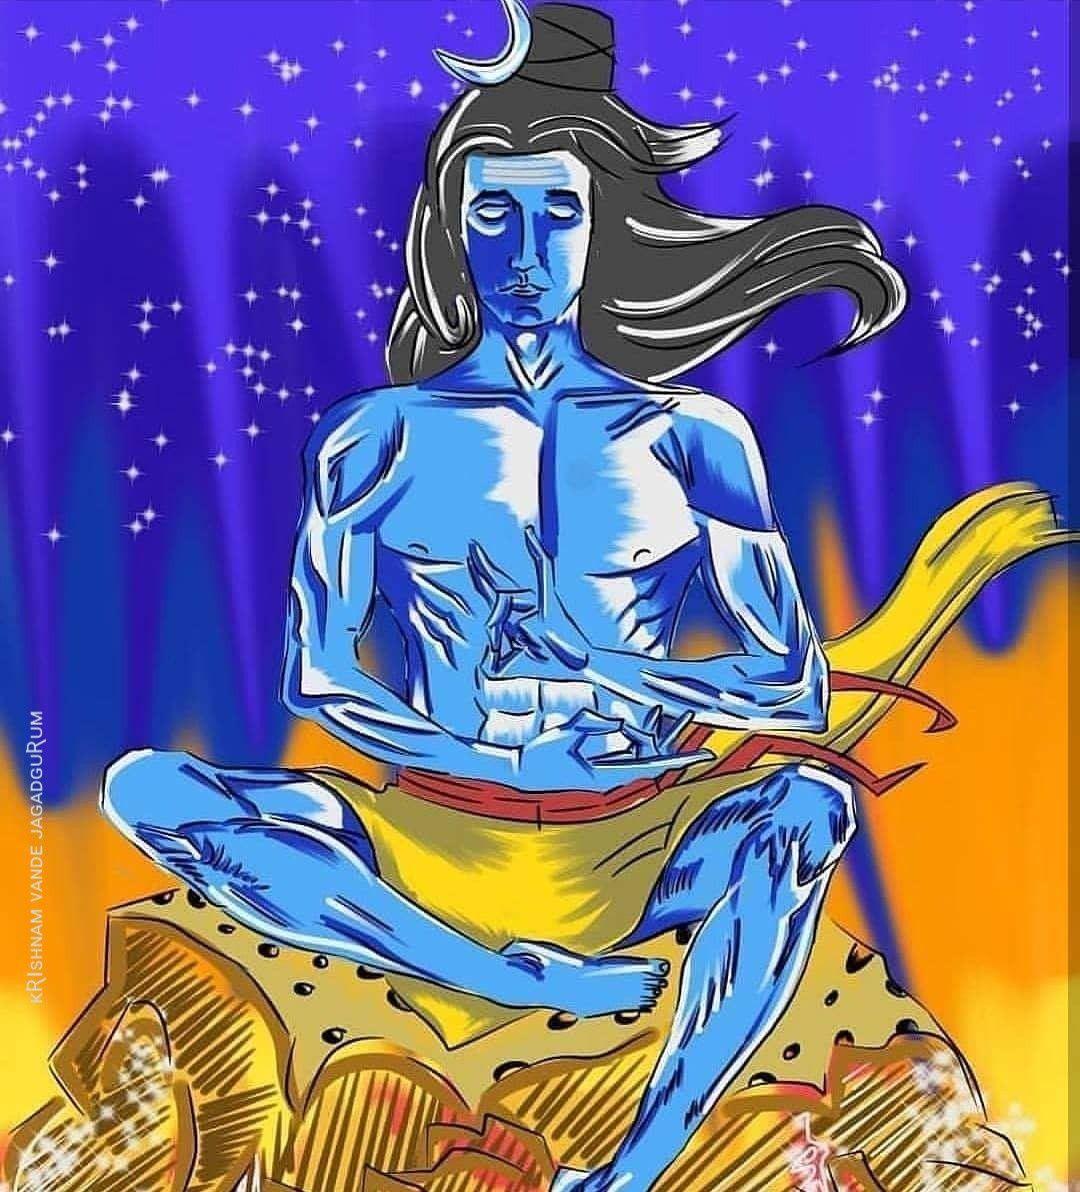 💚 ᶜʰᵃⁿᵗ ᴴᵃʳᵉ ᴷʳⁱˢʰⁿᵃ ᵃⁿᵈ ᴮᵉ ᴴᵃᵖᵖʸ 💚 #sweet_lord_krishna #krishnaquotes #krishna_quotes ★彡Krishnasthu Bhagawan Swayam彡★ 🆂🆆🅴🅴🆃 🅻🅾🆁🅳 🅺🆁🅸🆂🅷🅽🅰 💜Jai Shri Krishna💜💚 #Chant_HareKrishna and be #Happy 💜♥️ Hare Krishna ♥️💜 💚 Jai Shri Radhe Krishna 💚 Radhe Radhe !! Hare Krishna Krishnasthu Bhagawan Swayam